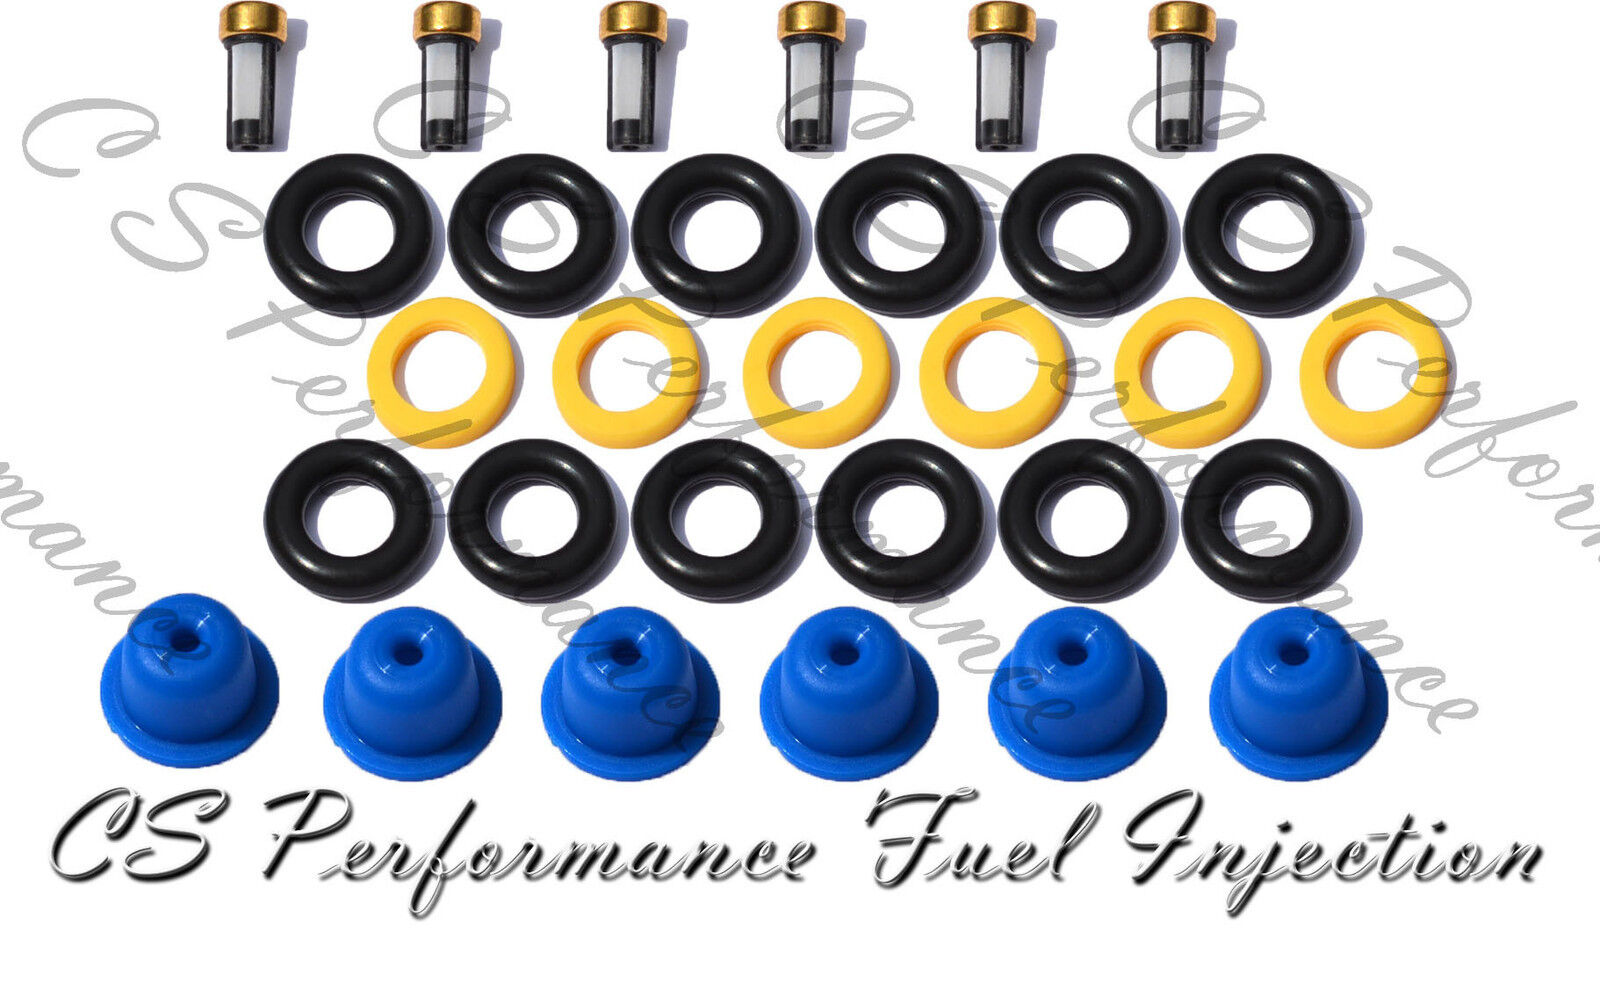 PINTLE CAPS FUEL INJECTOR KIT O-RINGS SPACER FILTER DODGE CHRYSLER 3.8 3.9 V6